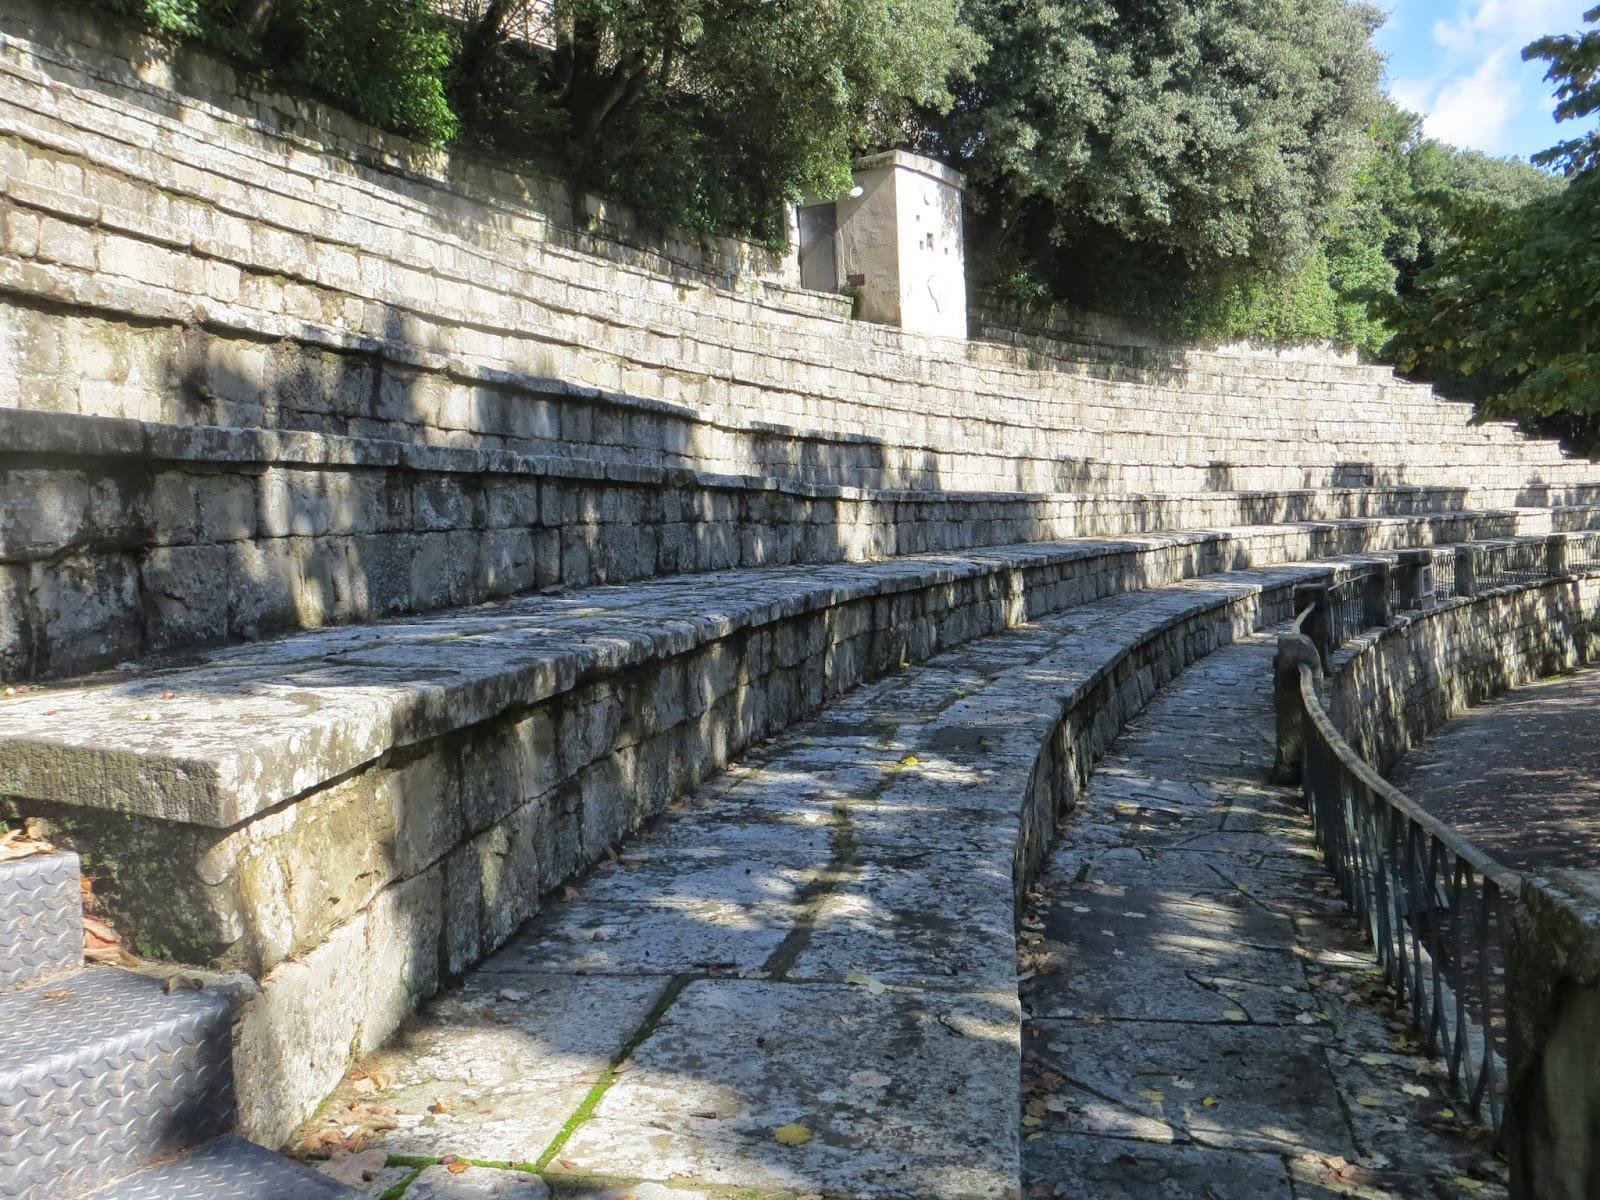 Roman Amphitheatre in Cortona, Italy